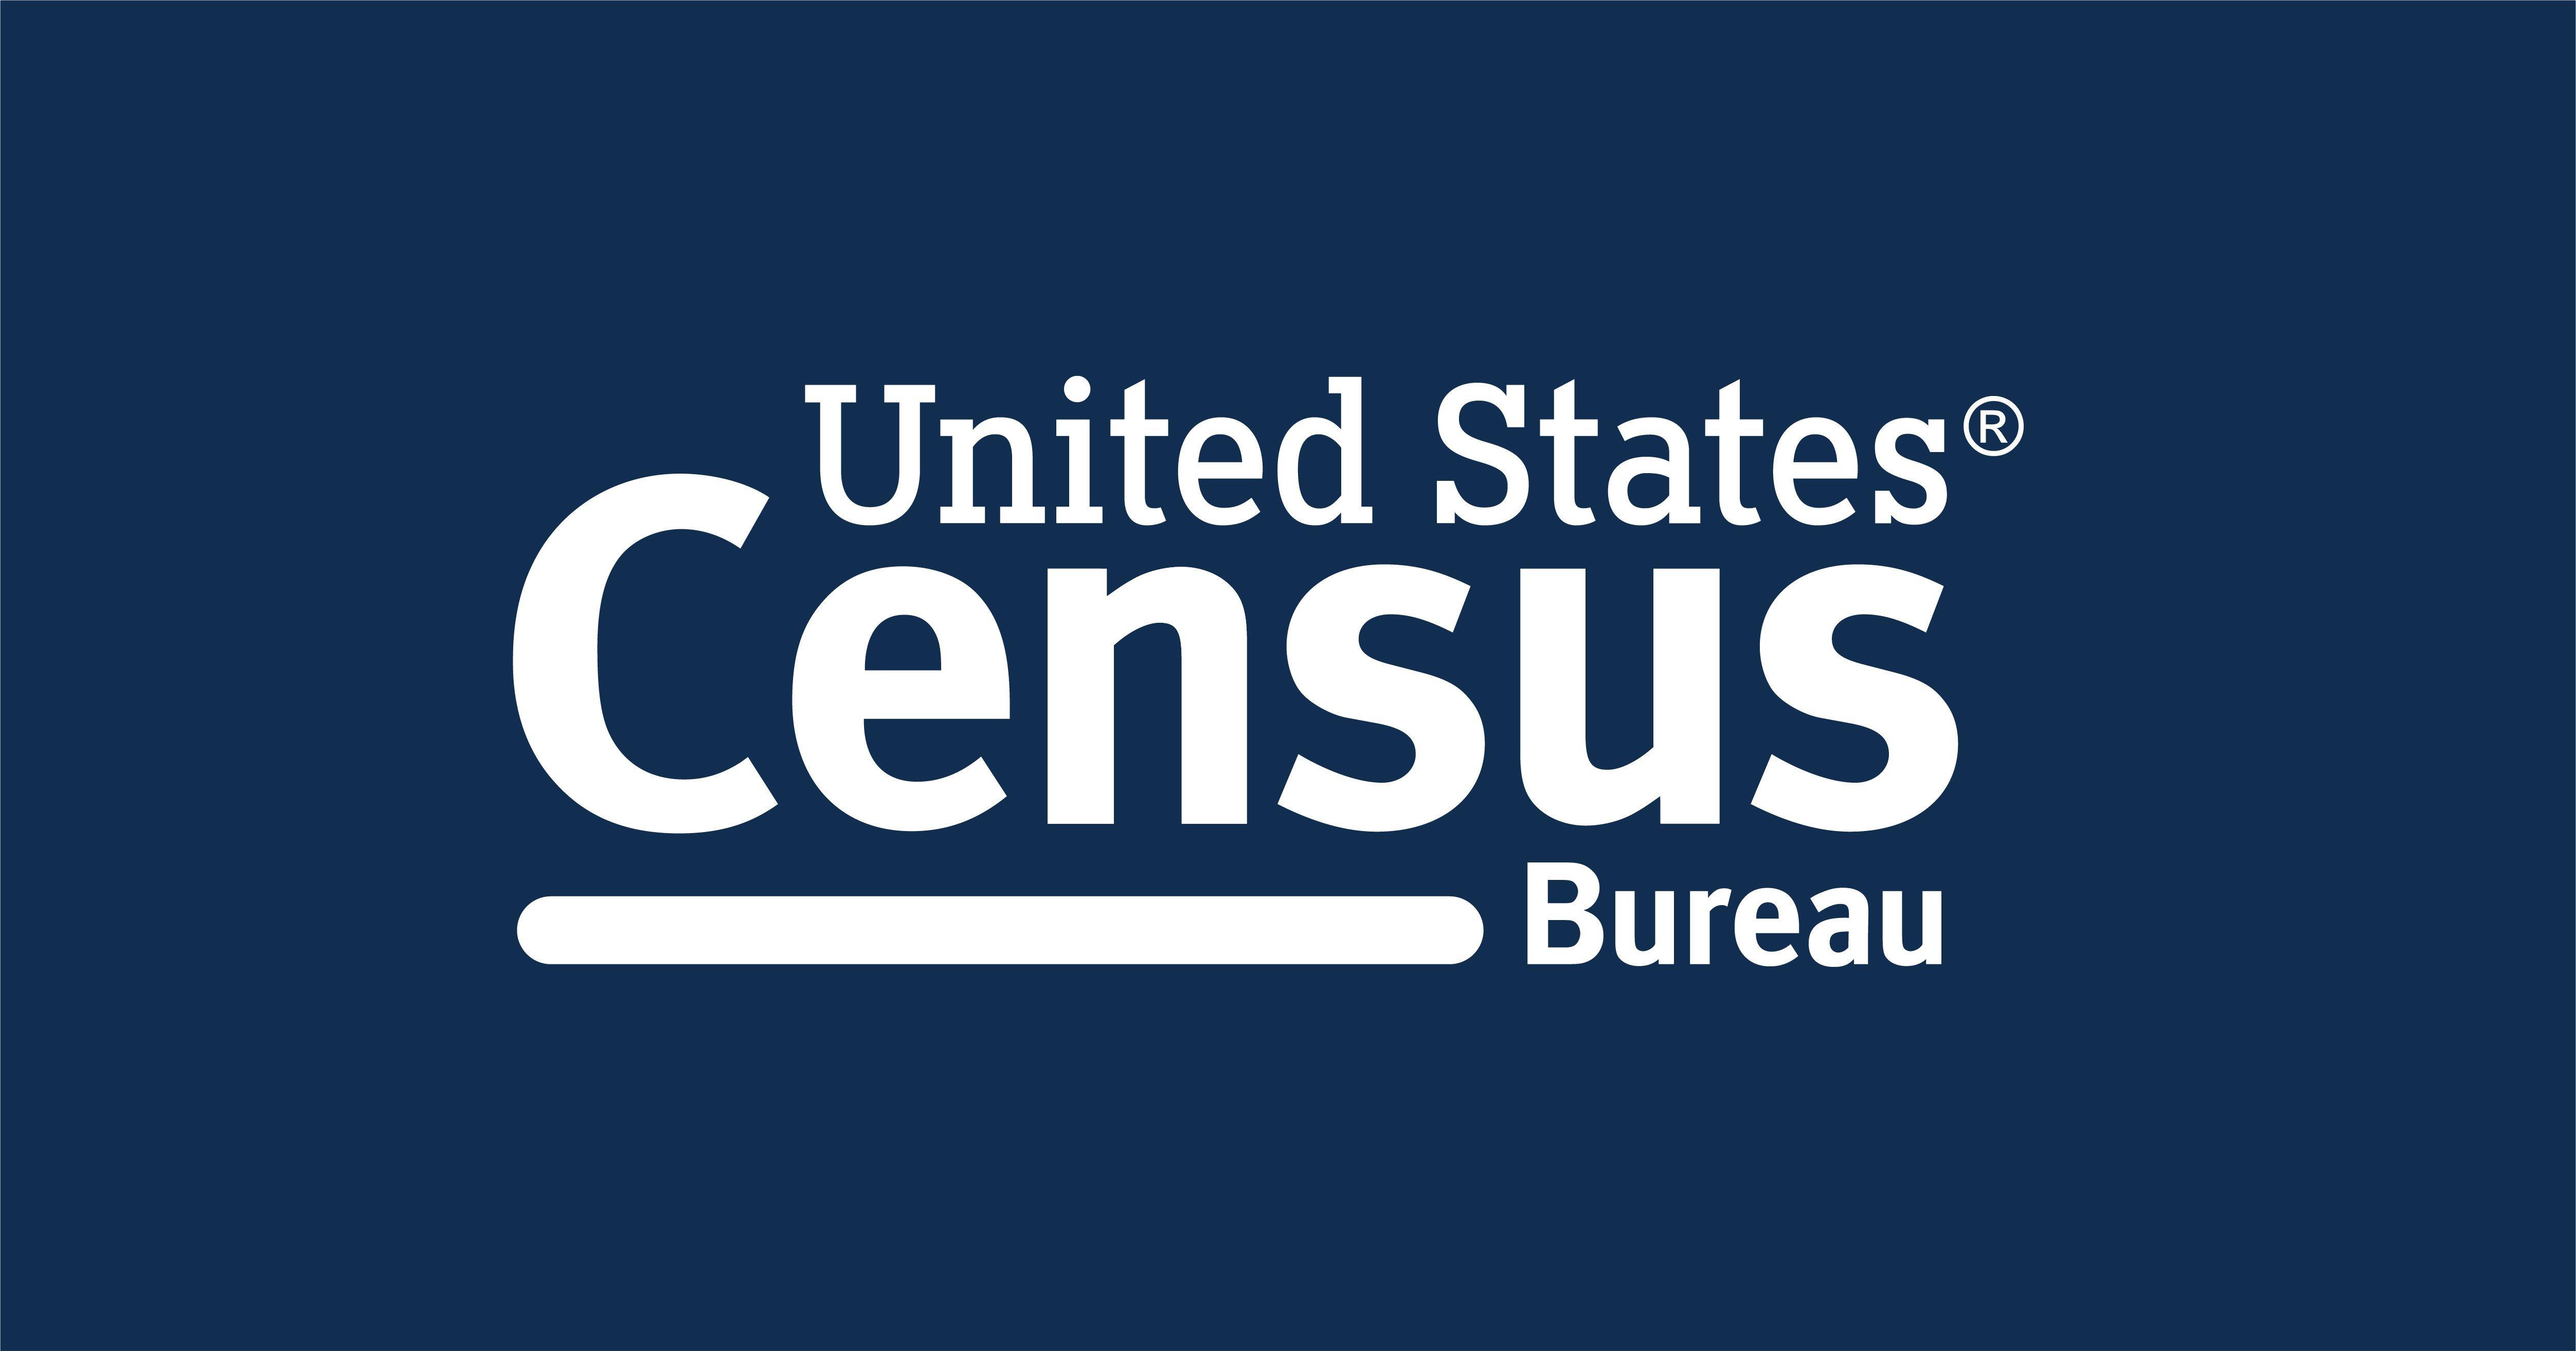 Census: Metro areas gained in Nebraska, rural areas lost